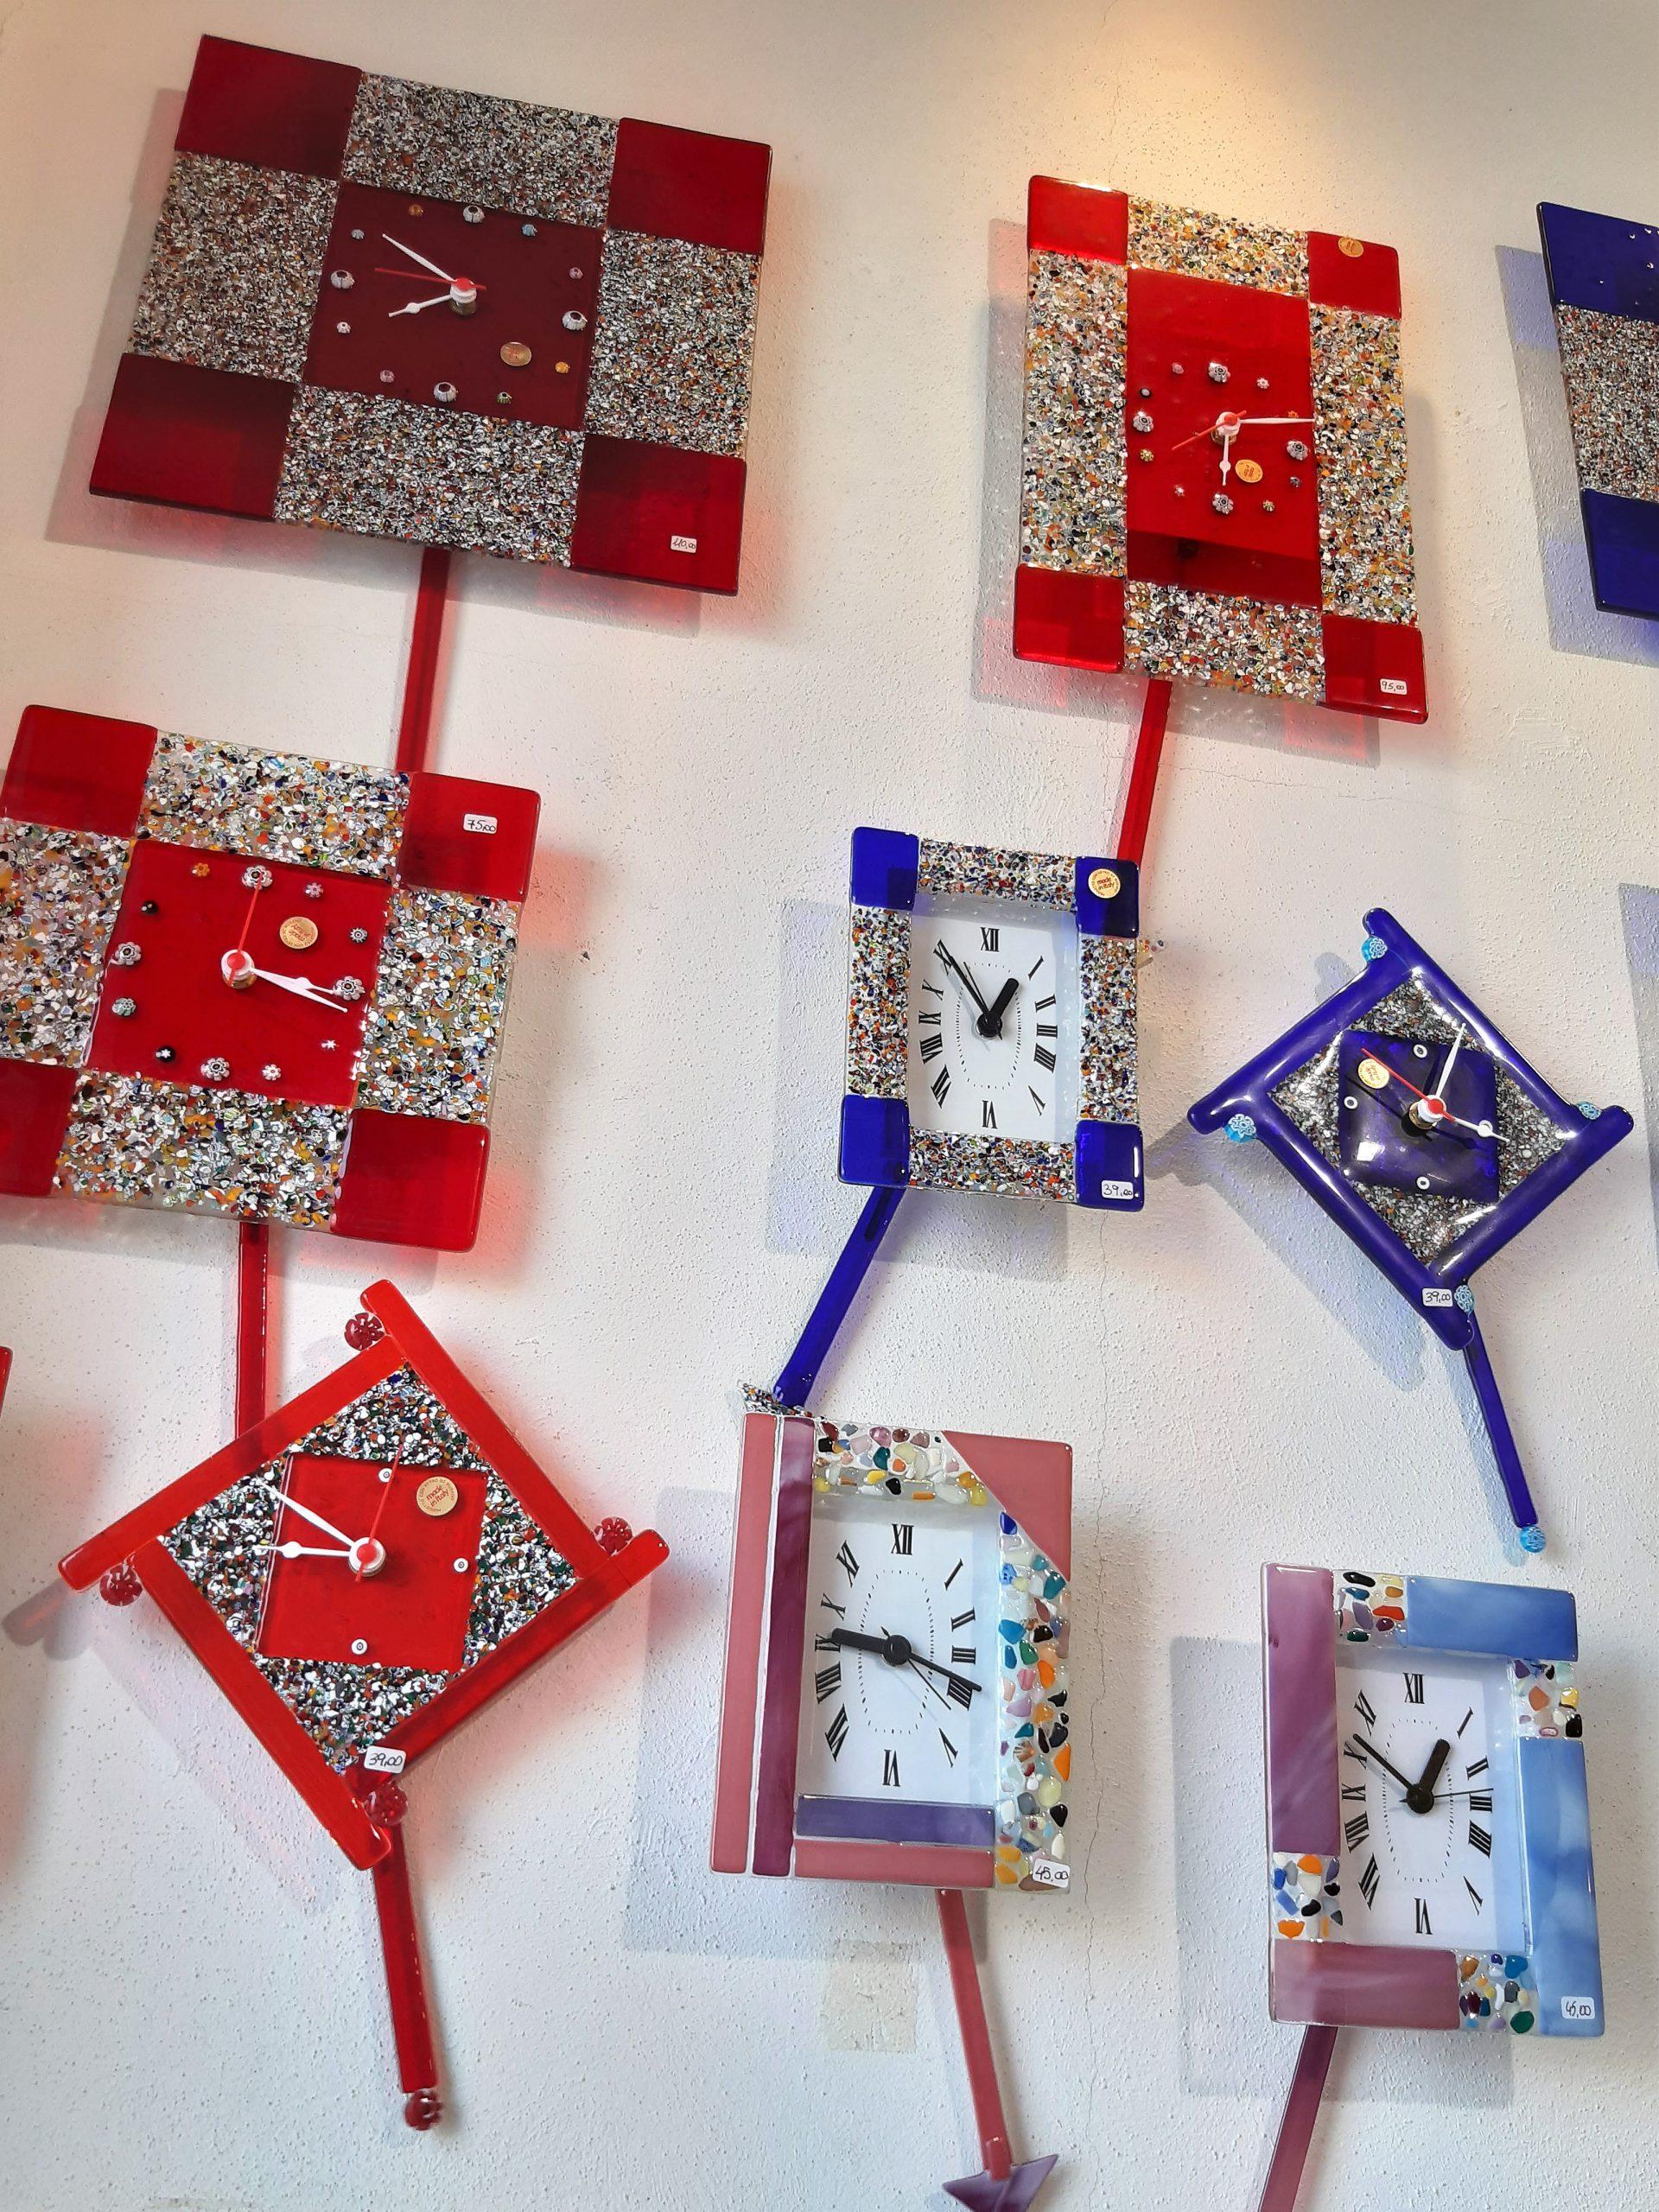 Bunte Kunstwerke aus Glas, Murano